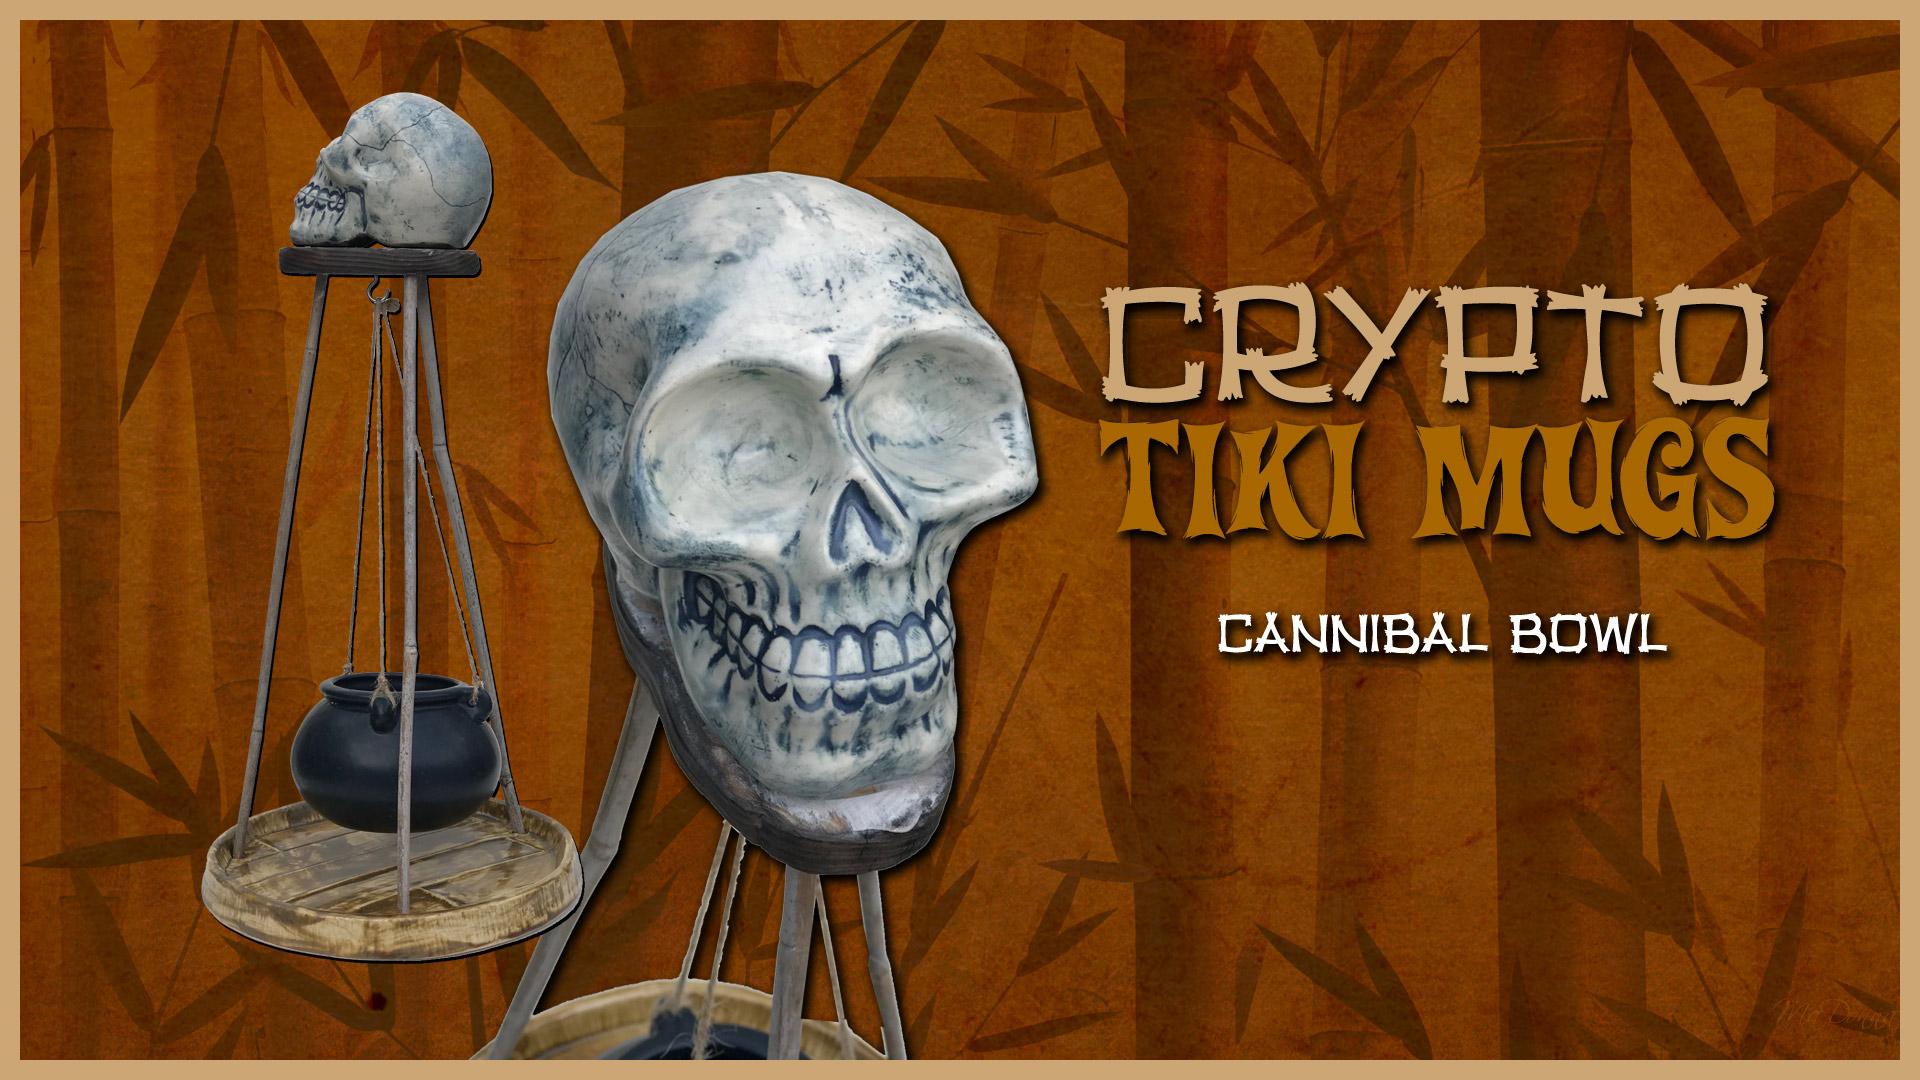 Cannibal Bowl